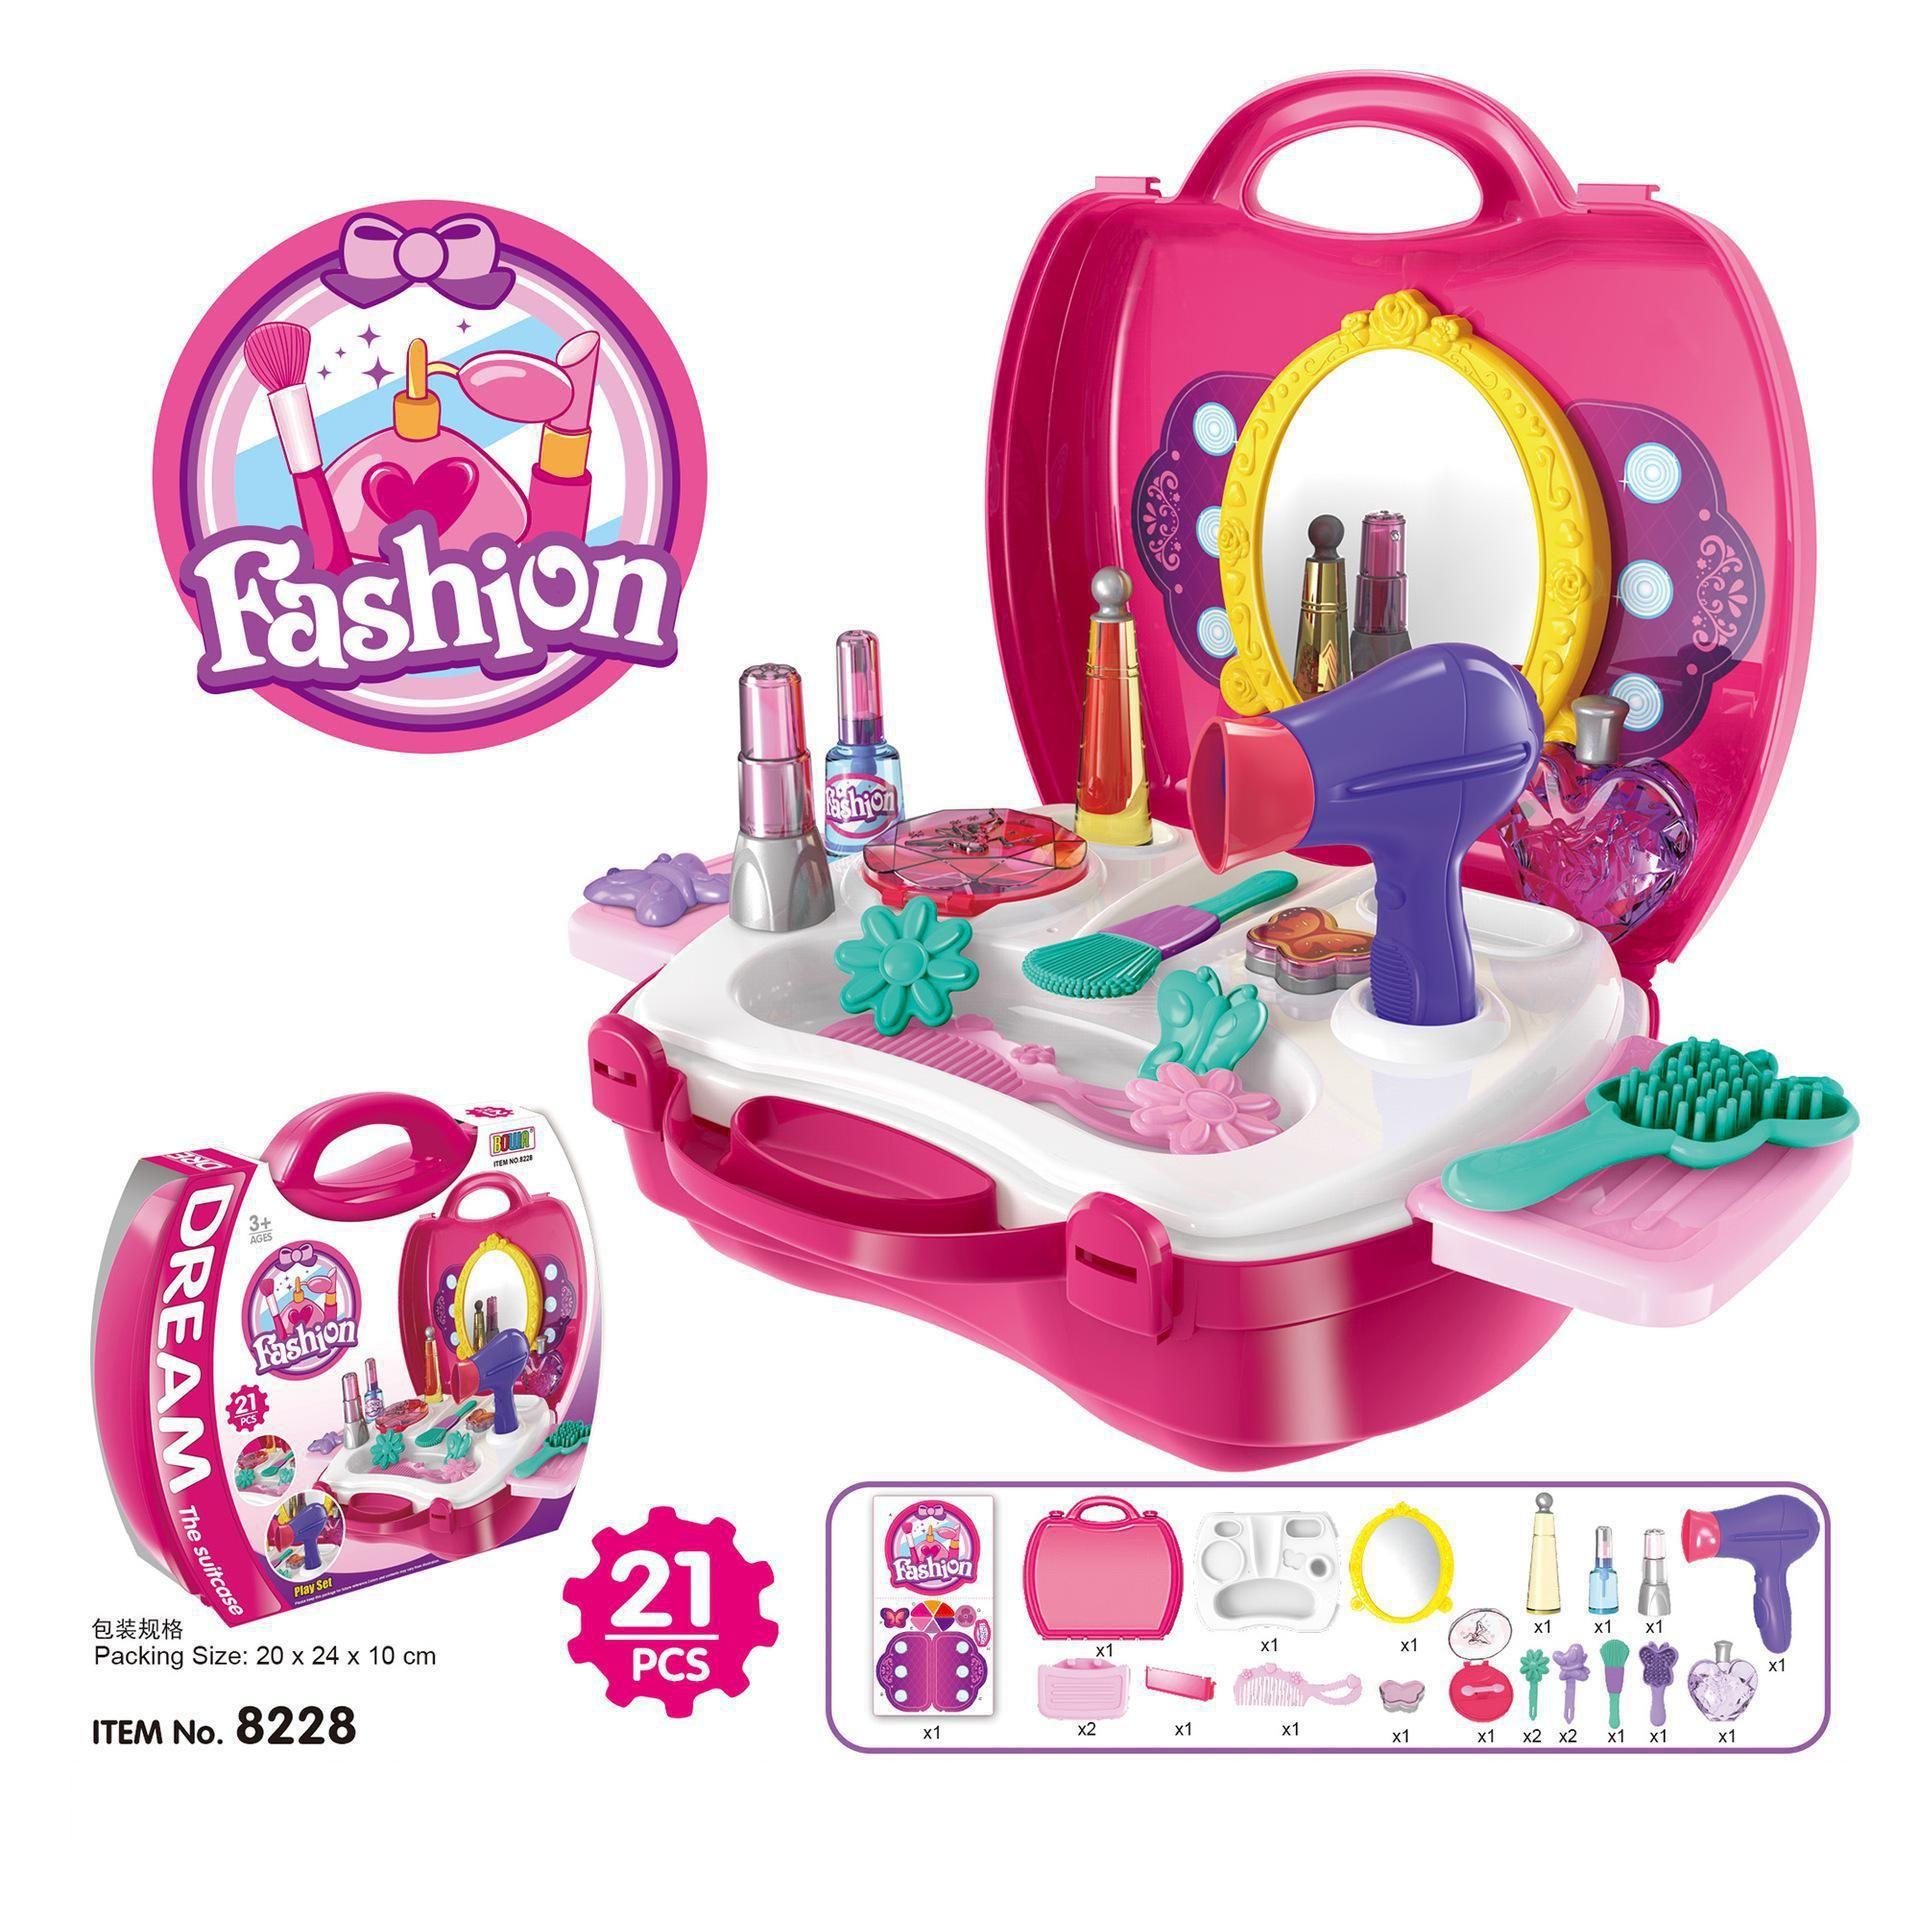 BOHS Kitchen Dresser Suit Toolbox Kit Multi Options Children Pretend Play Toy